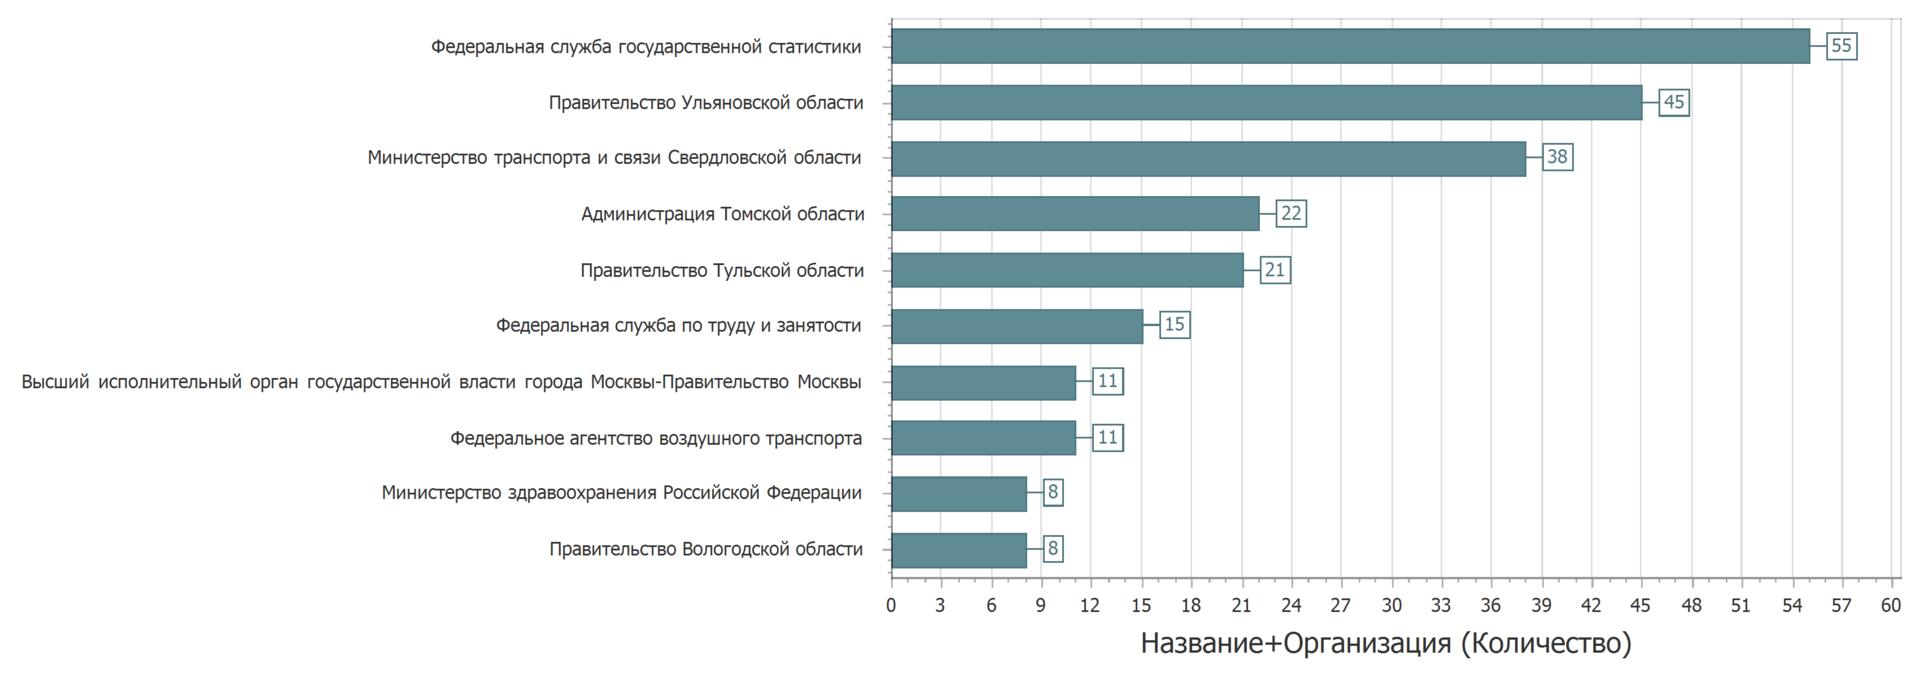 Анализ наборов данных с портала открытых данных data.gov.ru - 6